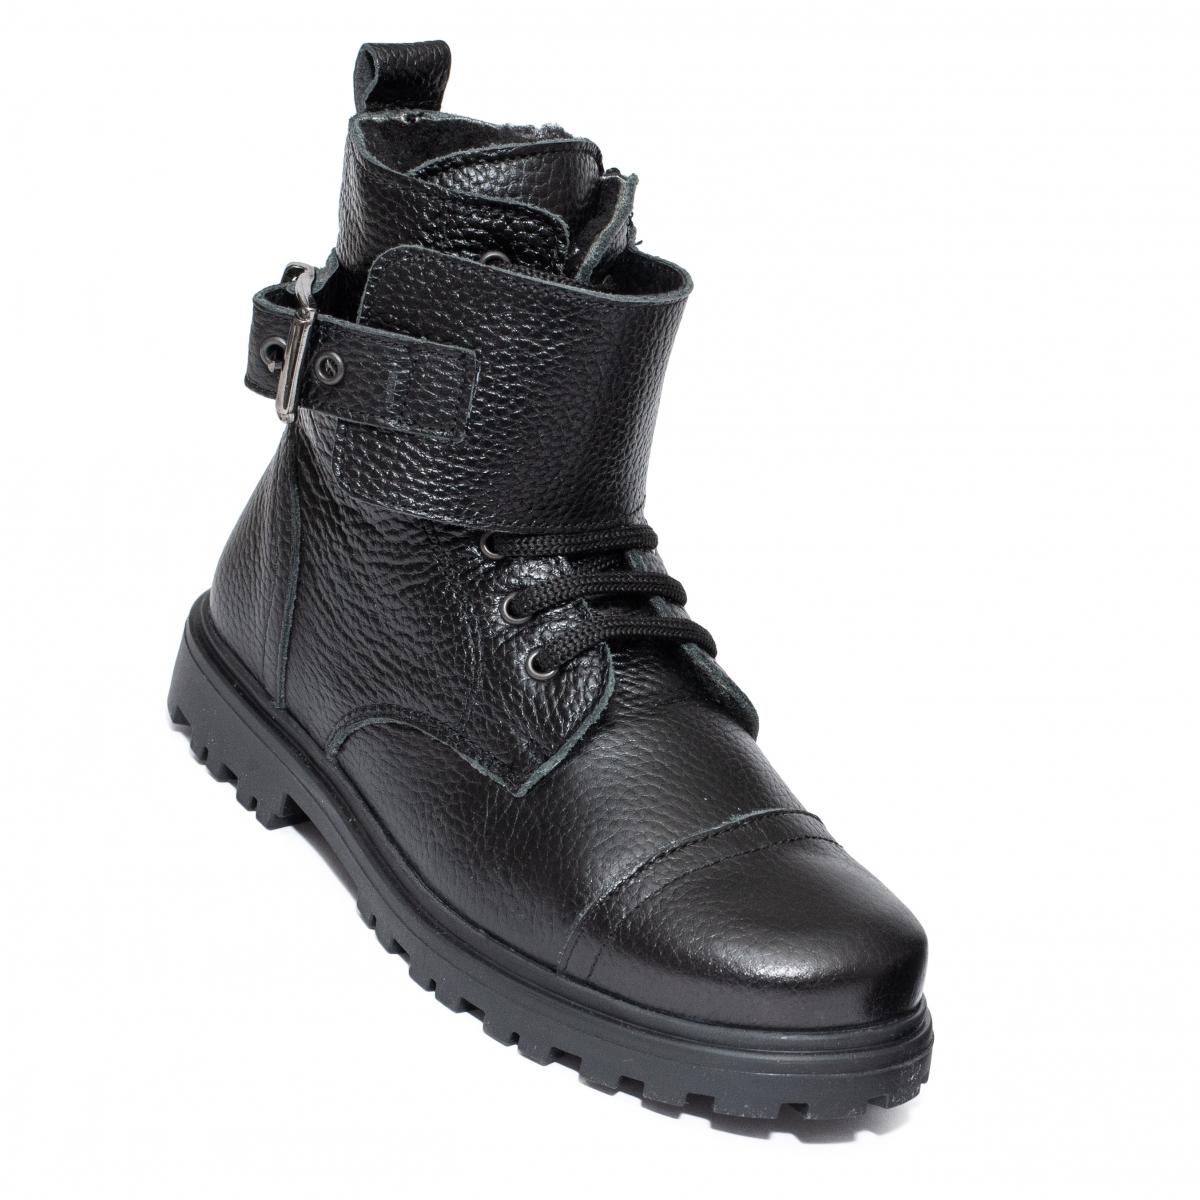 Ghete copii cu blana pj shoes Army negru box 31-37